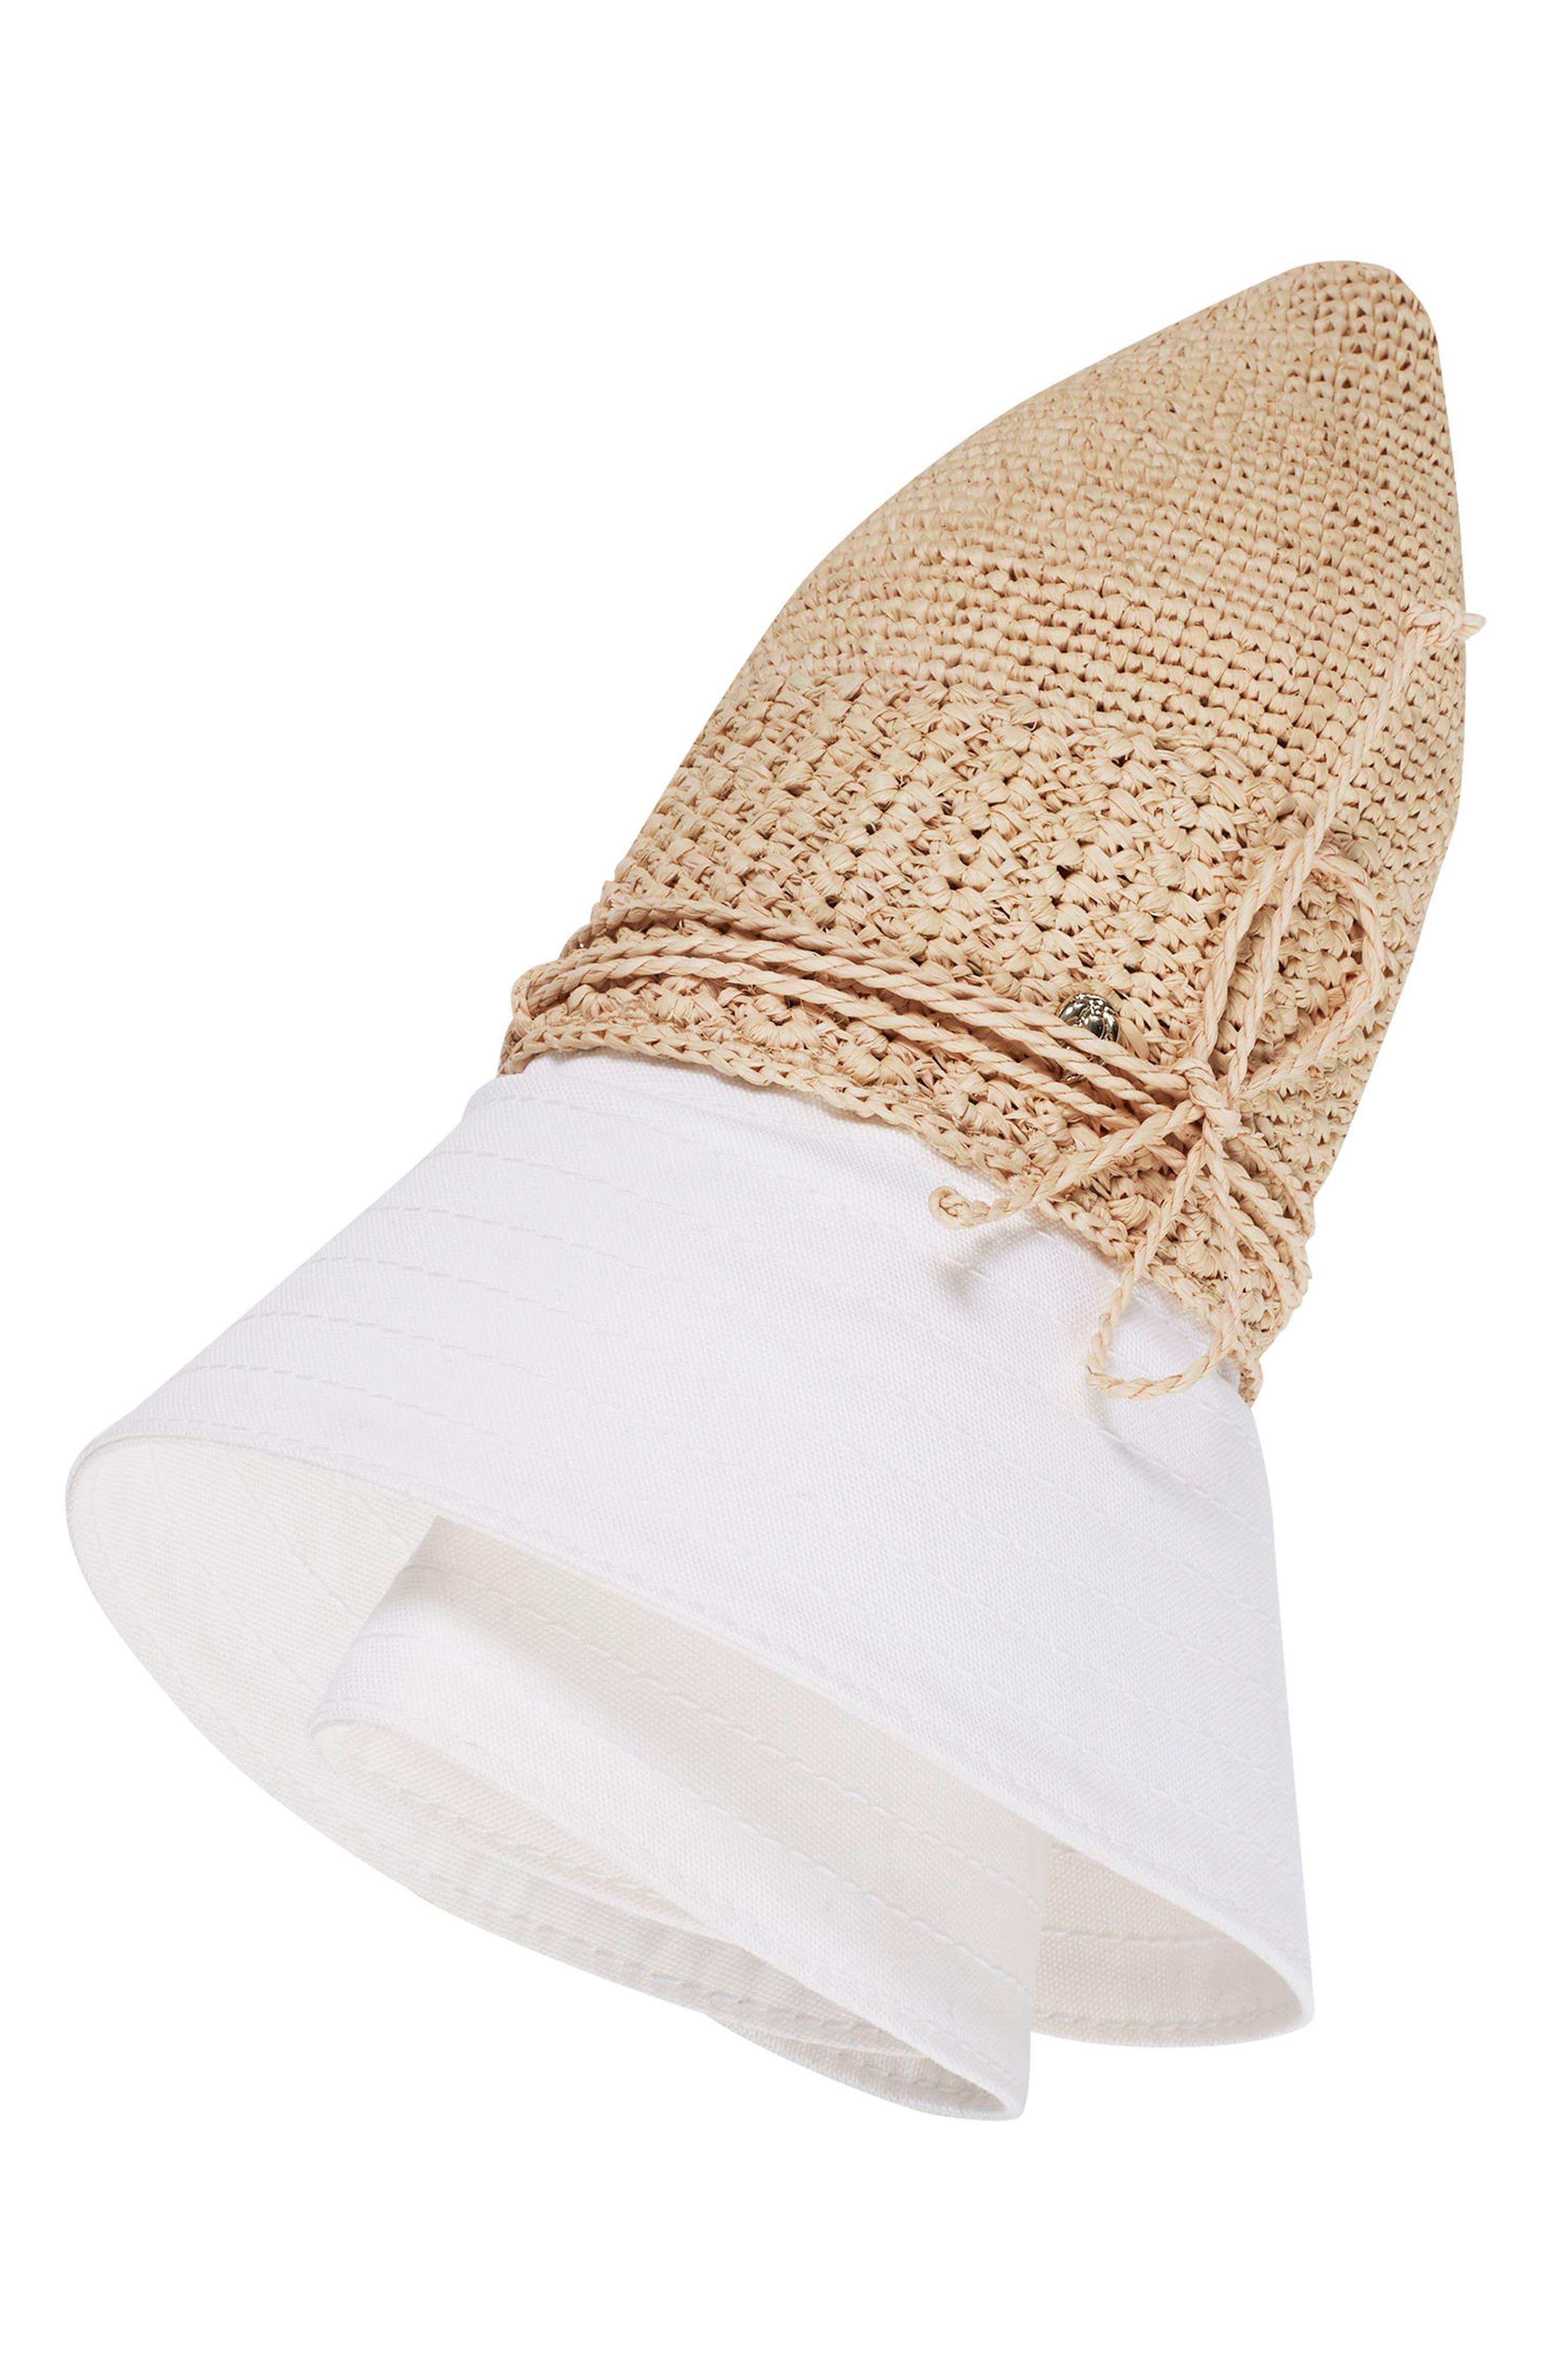 Cotton Brim Raffia Hat,                             Alternate thumbnail 3, color,                             Natural/ White